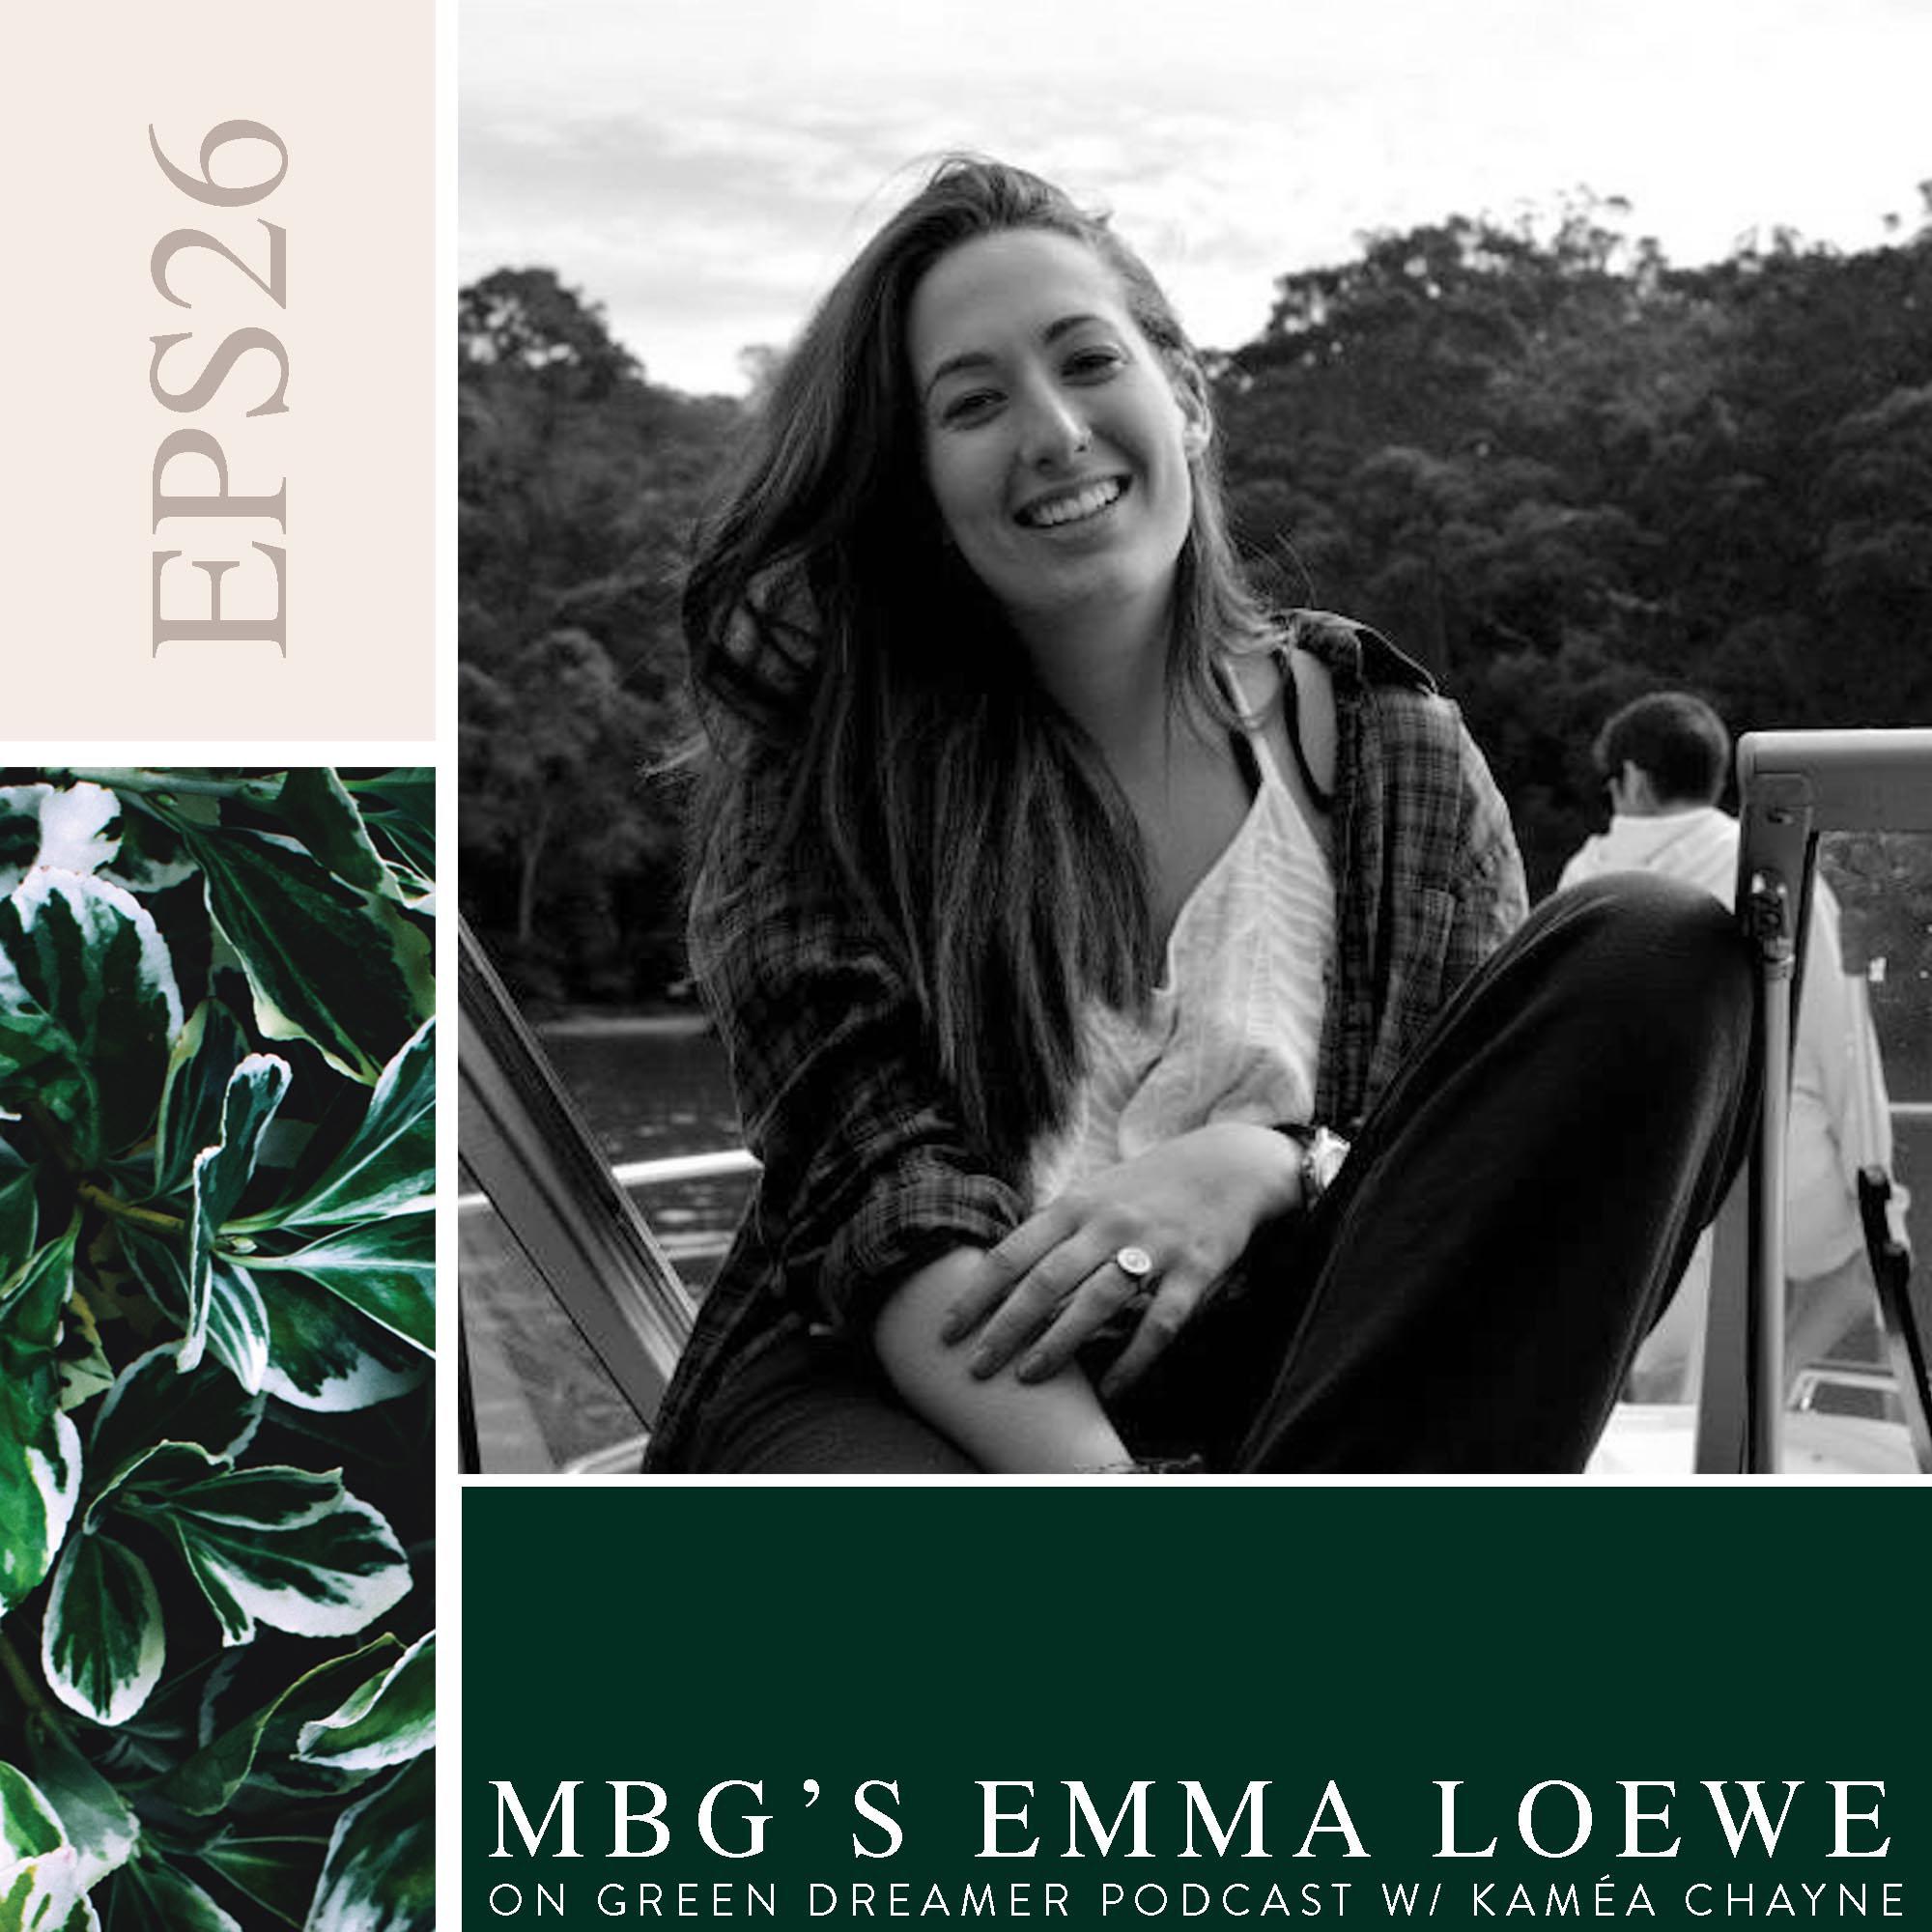 26) BW Emma-Loewe-mindbodygreen-talks-sustainability-on-Green-Dreamer-Podcast-with-Kaméa-Chayne.jpg